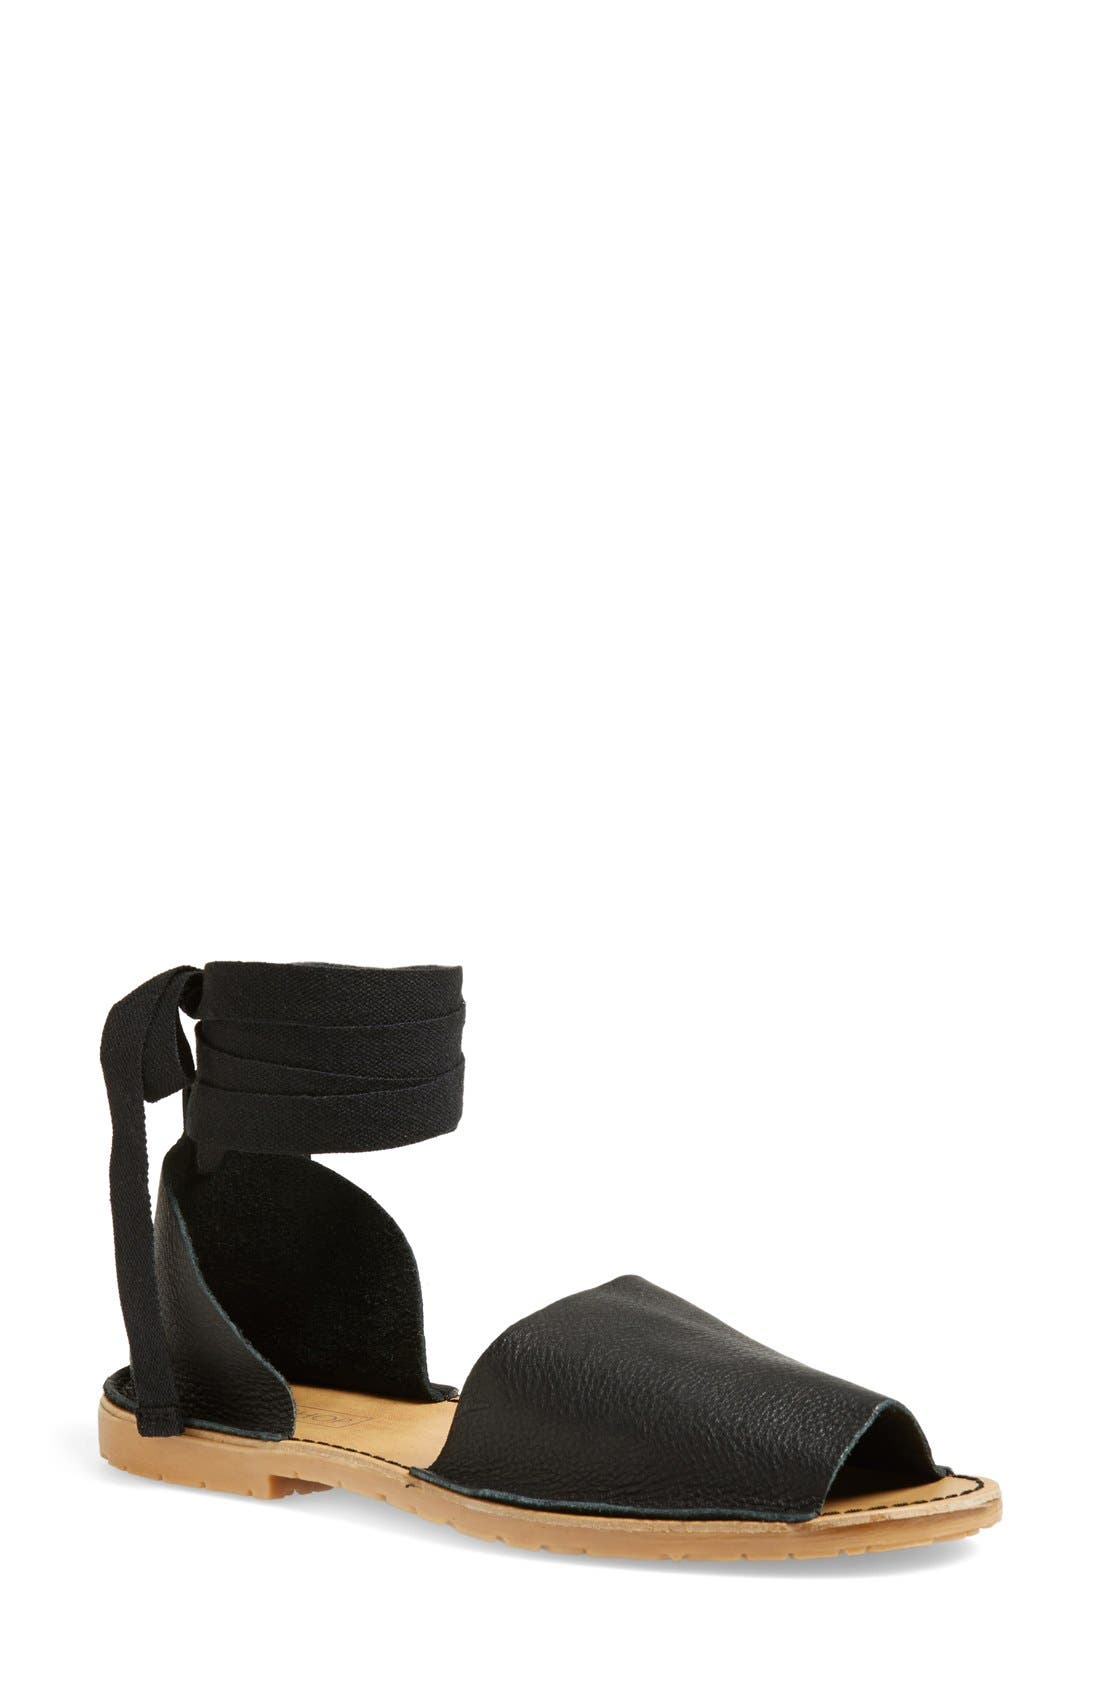 Alternate Image 1 Selected - Topshop 'Feline' Wraparound Ankle Strap Sandal (Women)